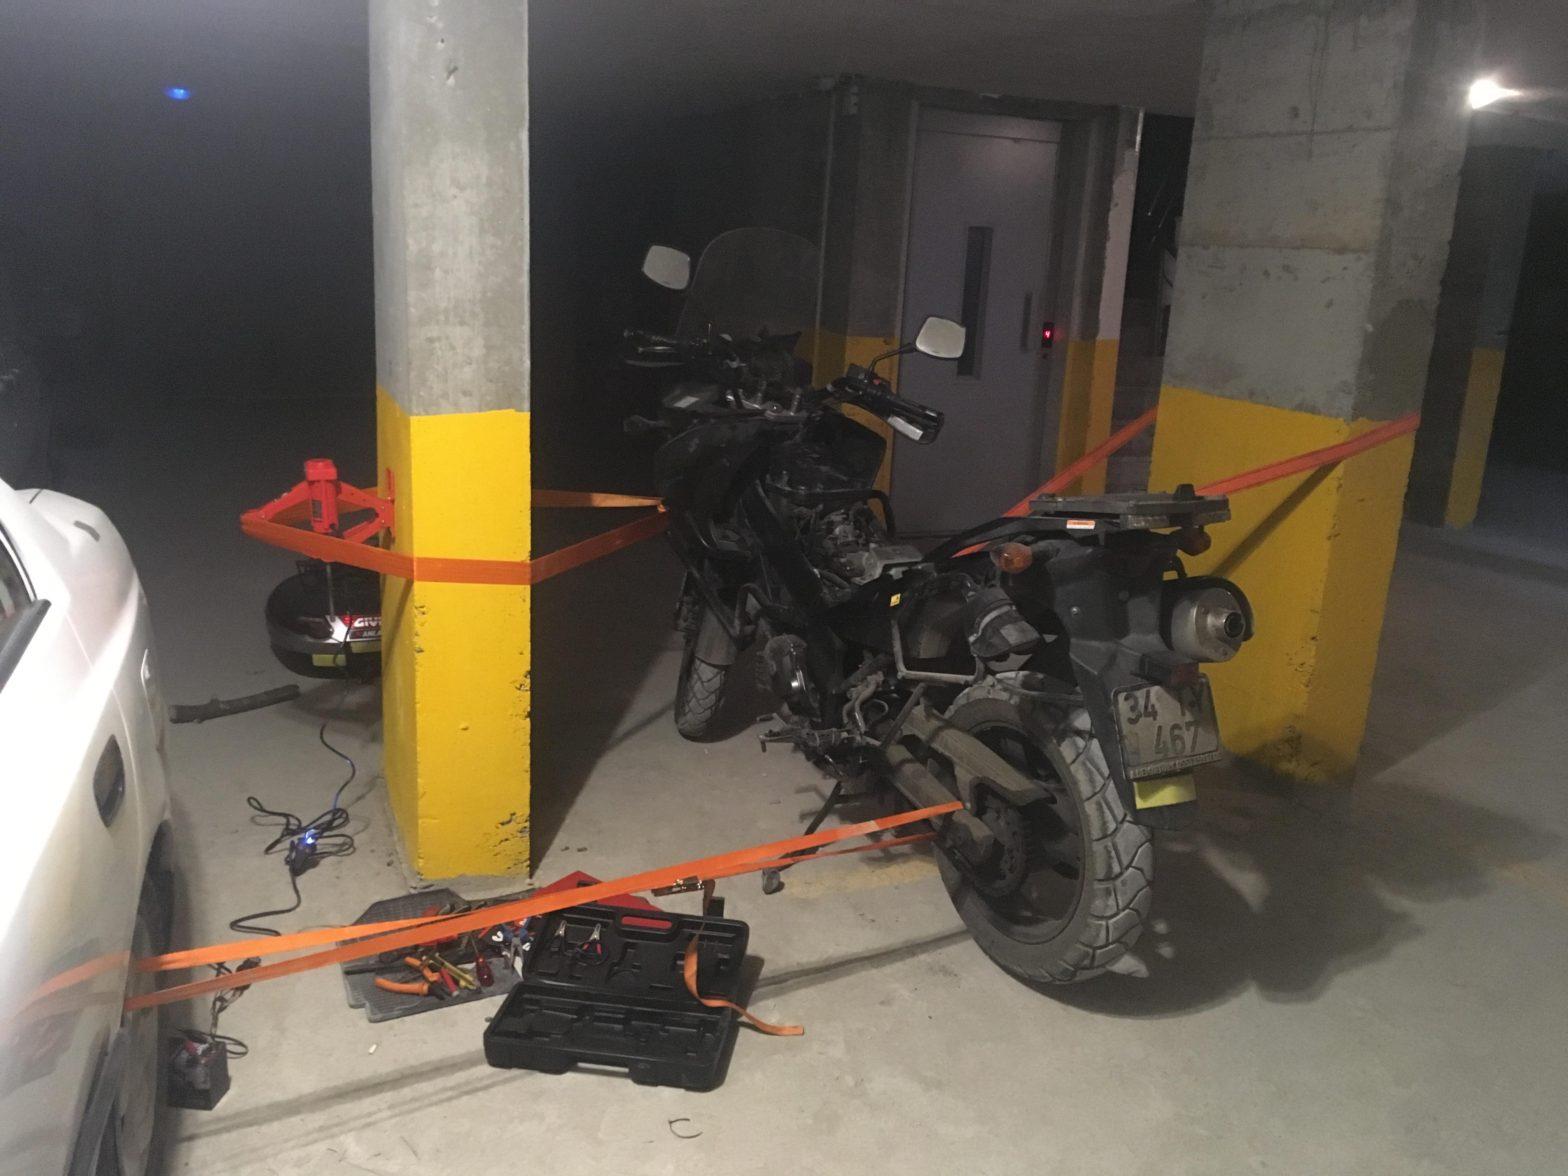 Yamulan Motosiklet Koruma Demiri Nasıl düzeltilir Suzuk v-strom DL650-1000